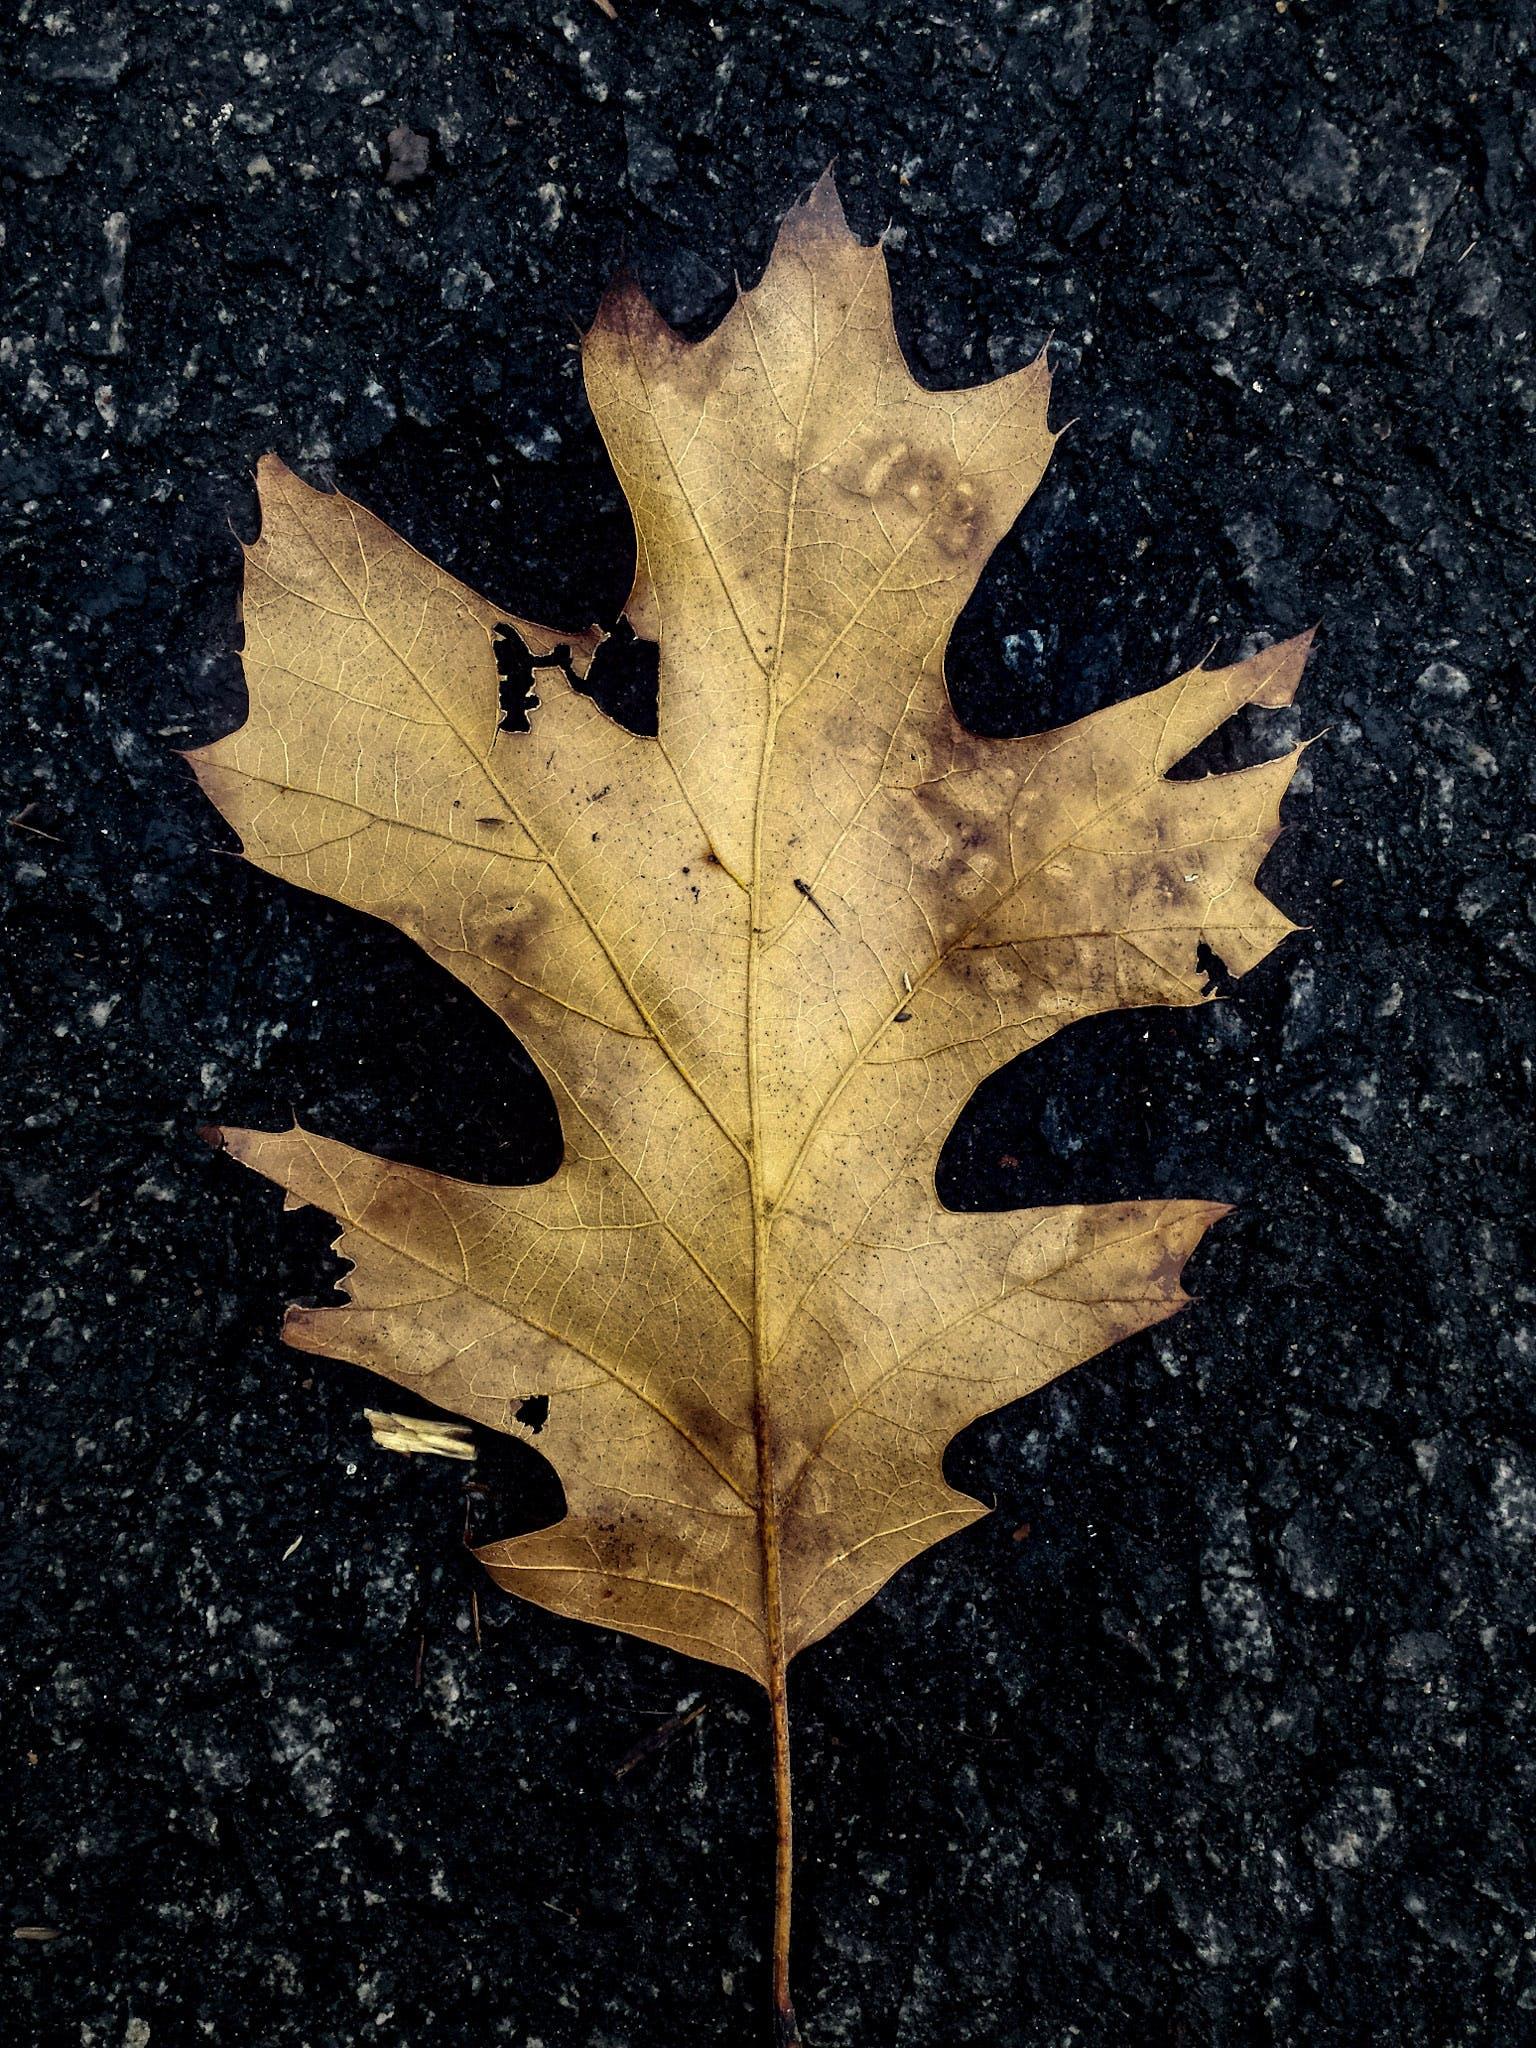 Free stock photo of dried leaf, leaf, oak leaf